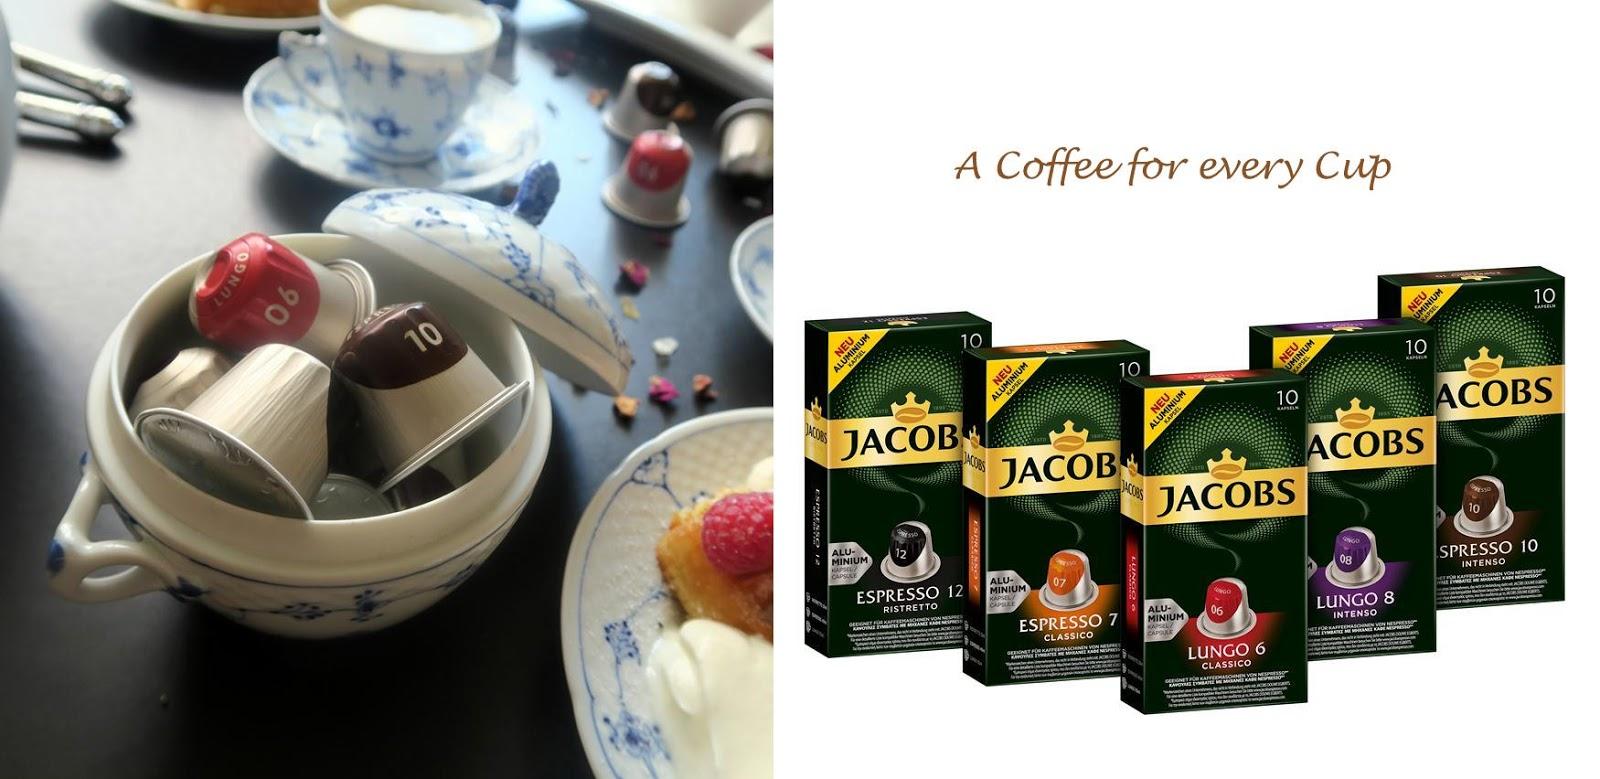 Kaffee Jacobs Kapseln